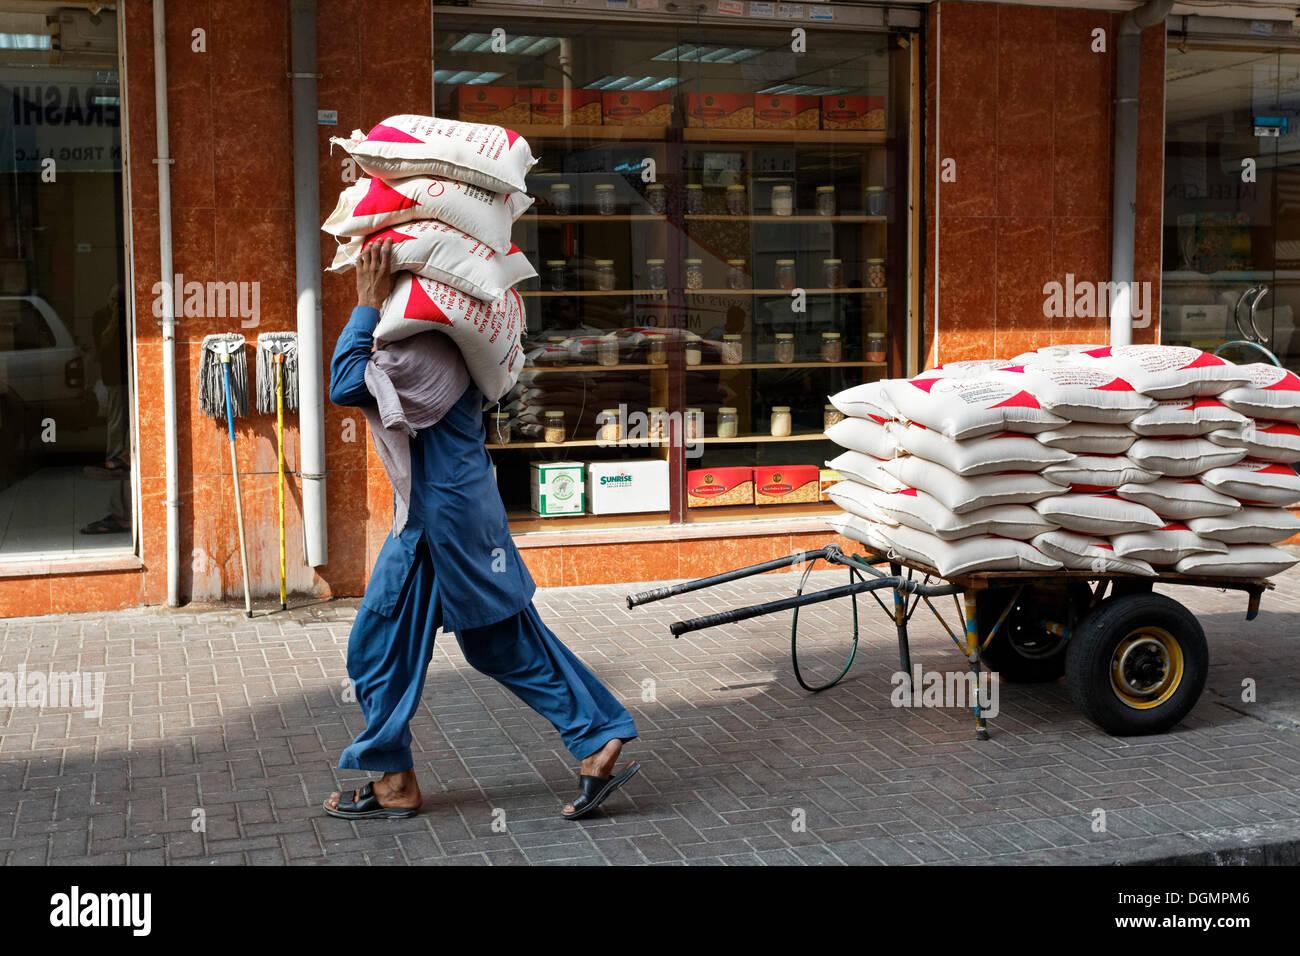 Worker carrying sacks of lentils on his shoulder, Deira, Old Souk, Dubai, United Arab Emirates, Middle East - Stock Image